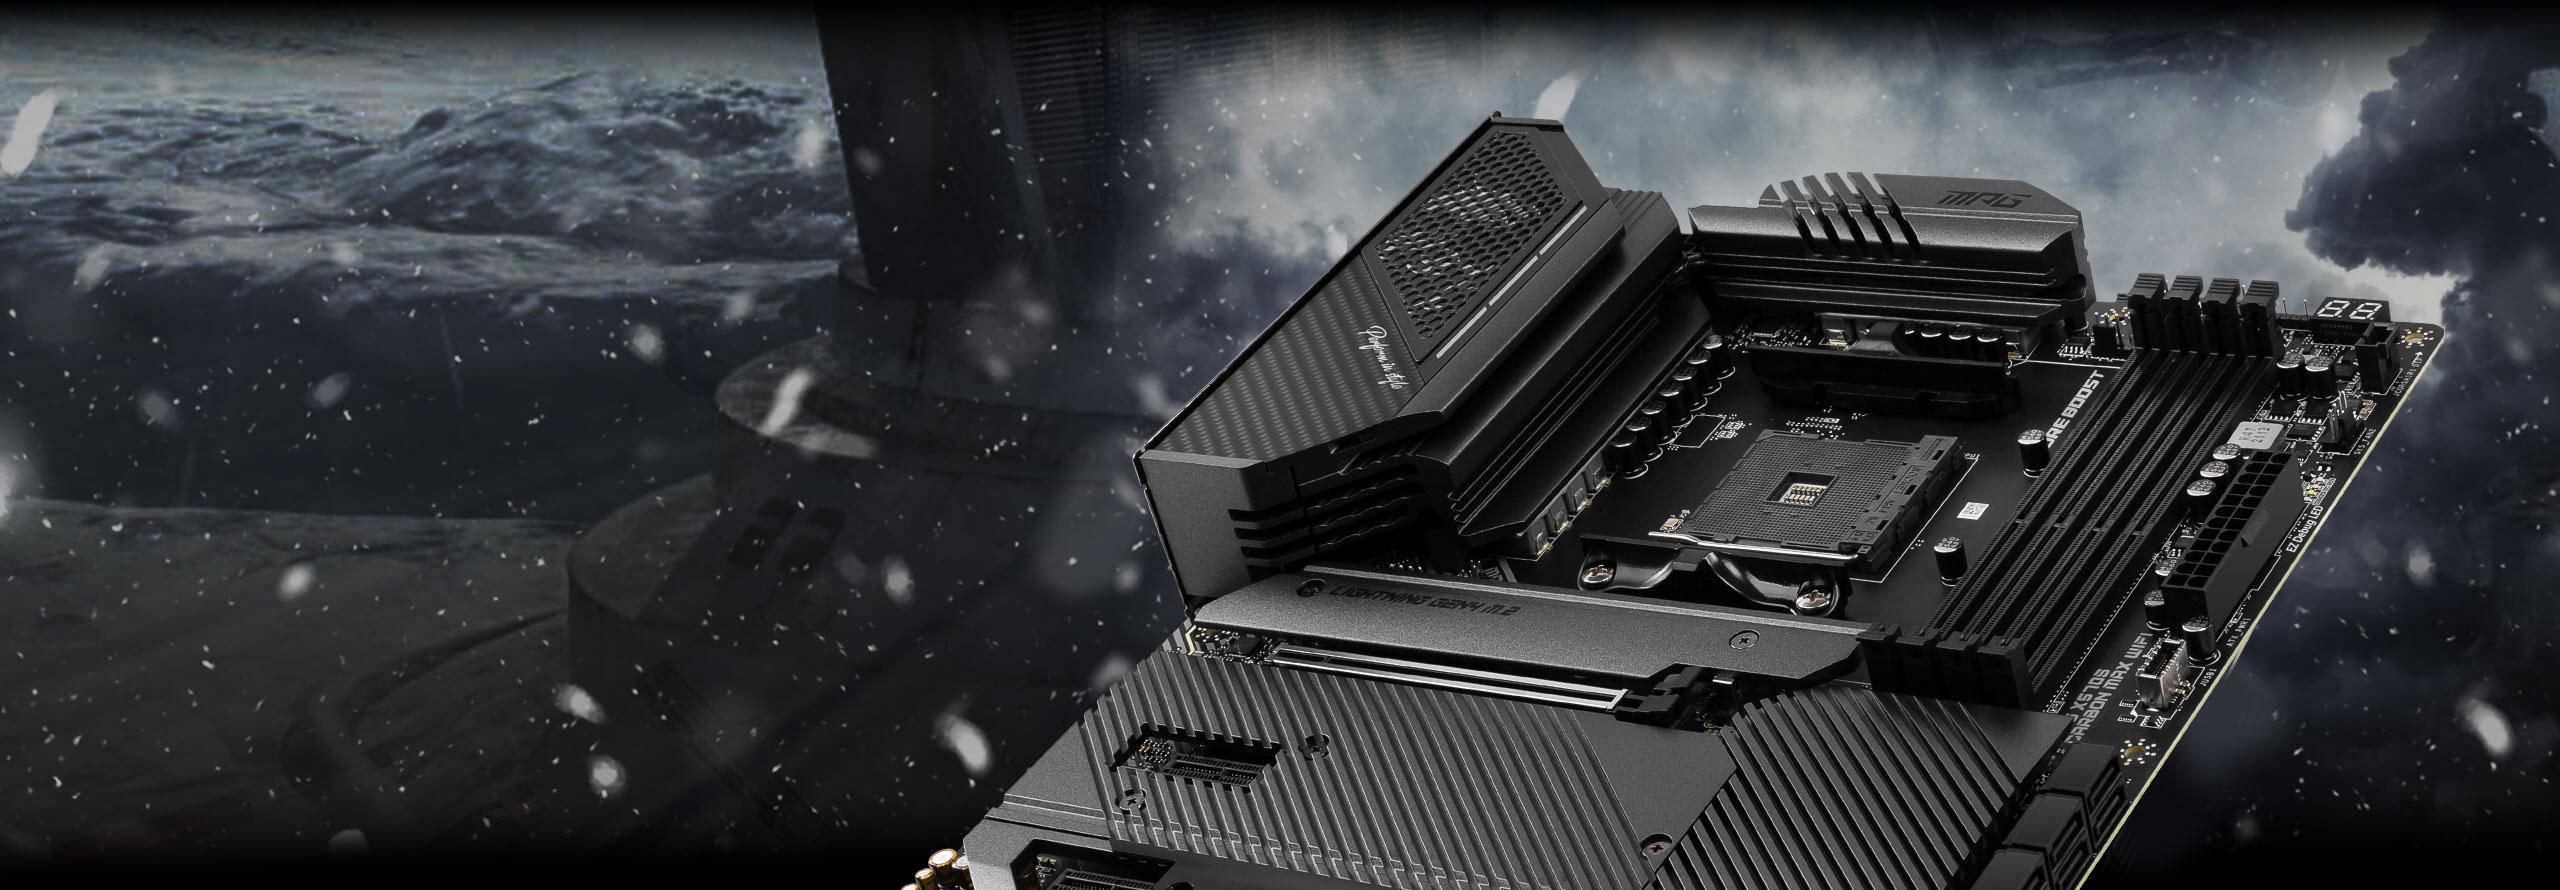 x570s carbon max wifi enhanced performance